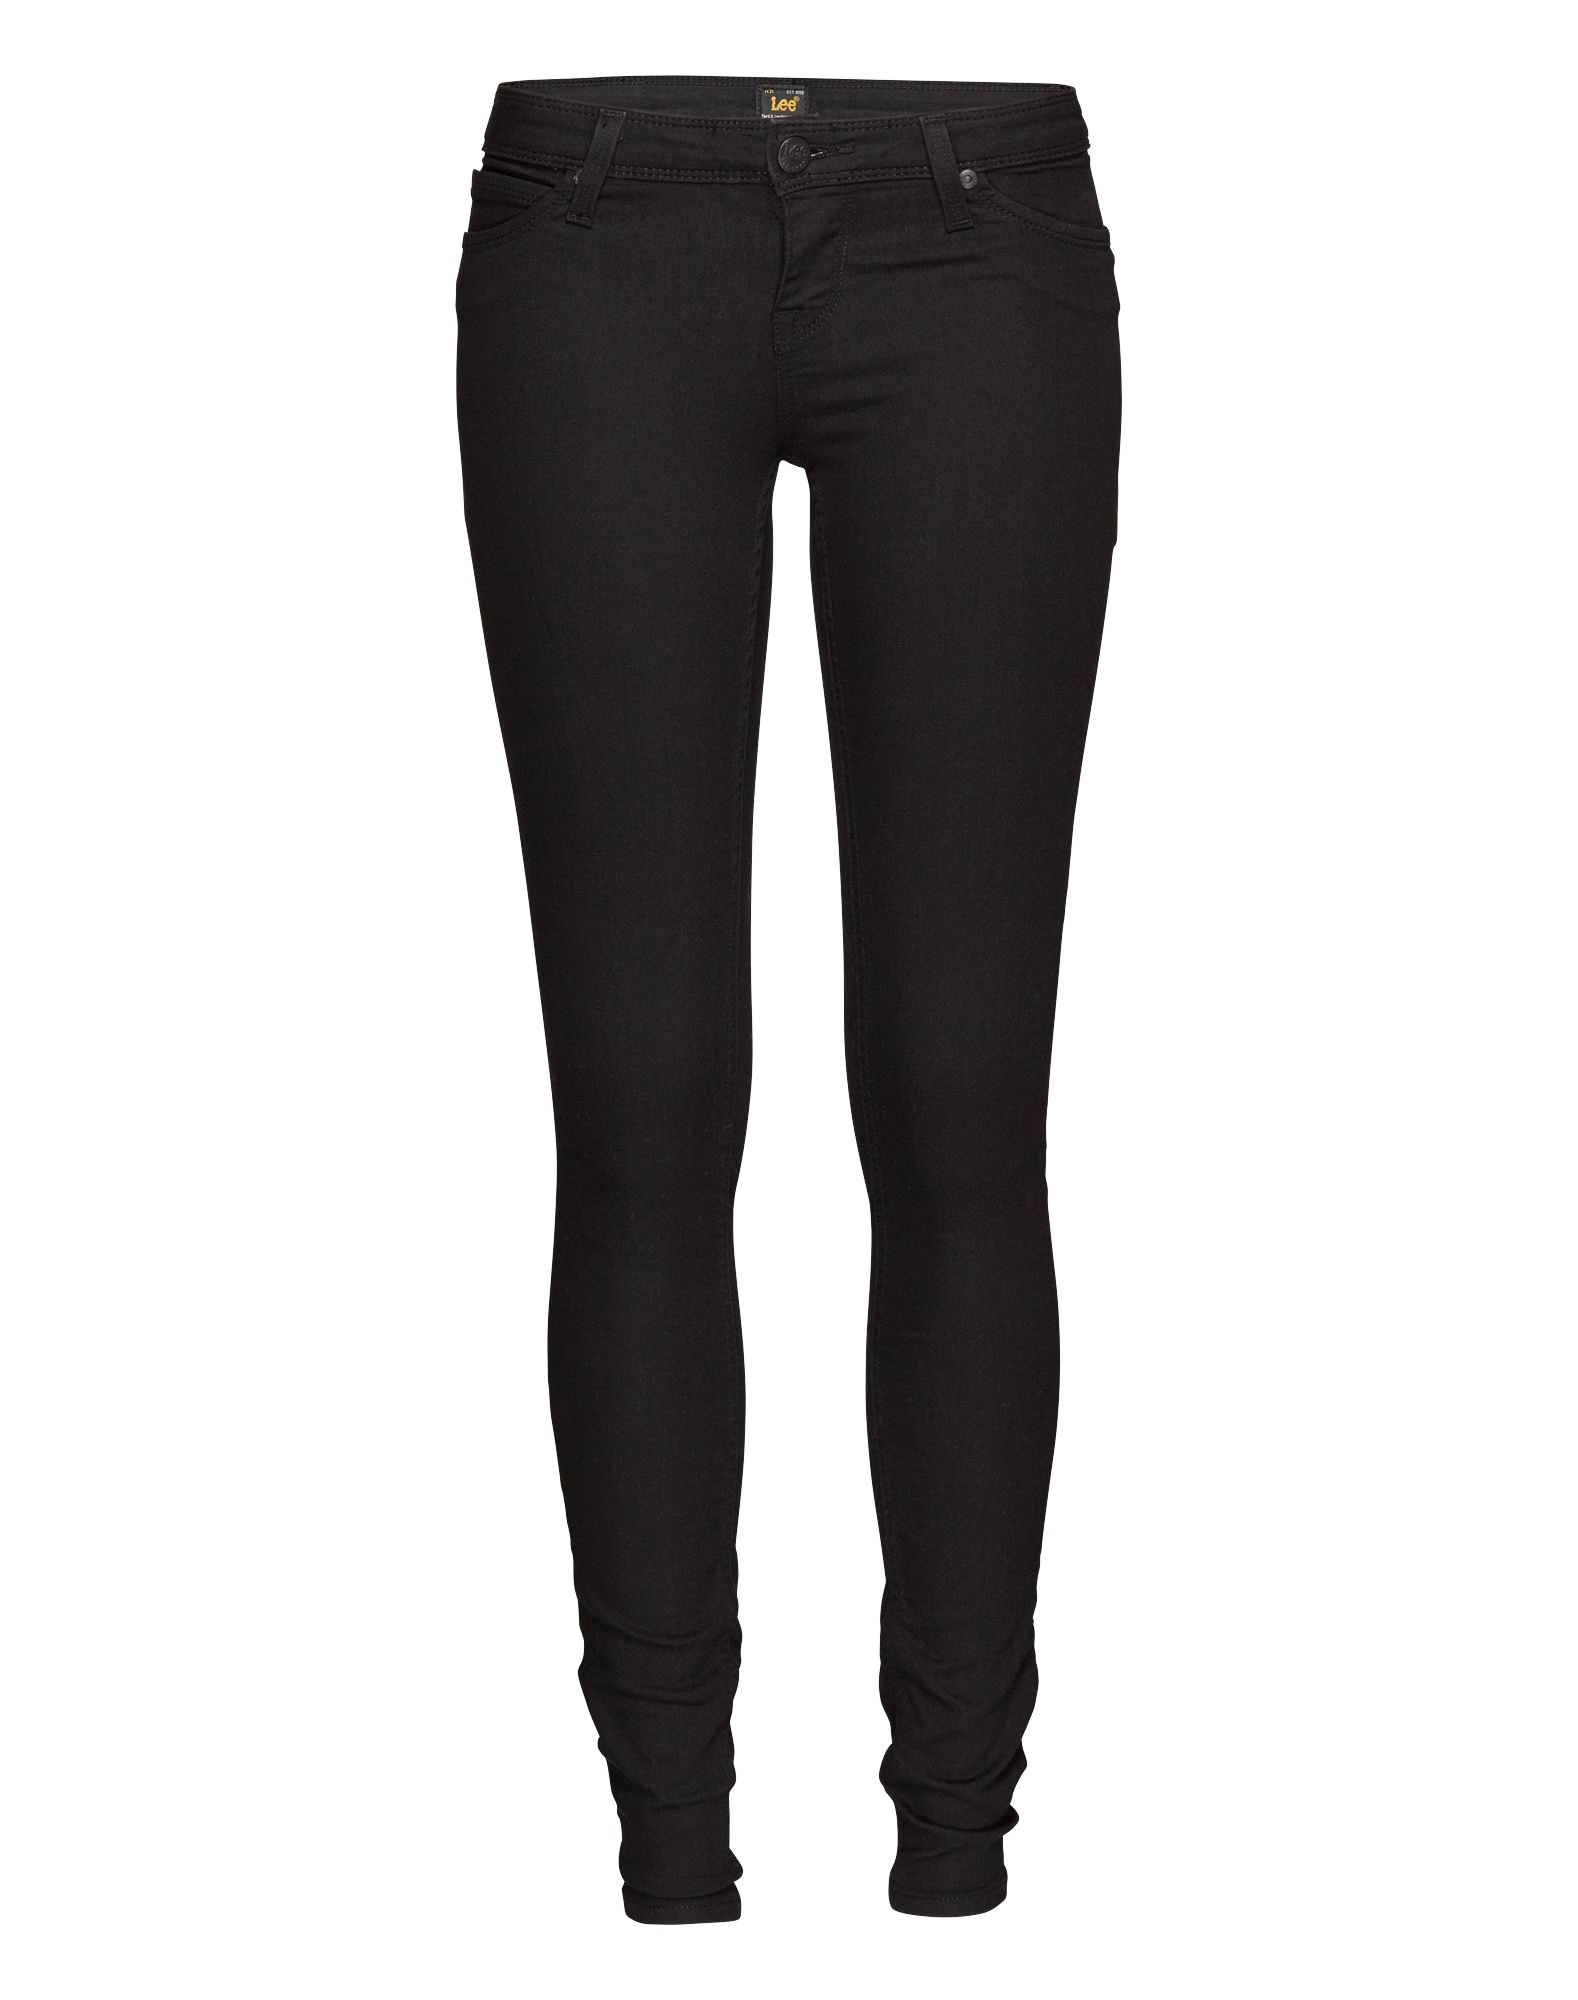 Lee Dames Jeans Toxey Super Skinny zwart